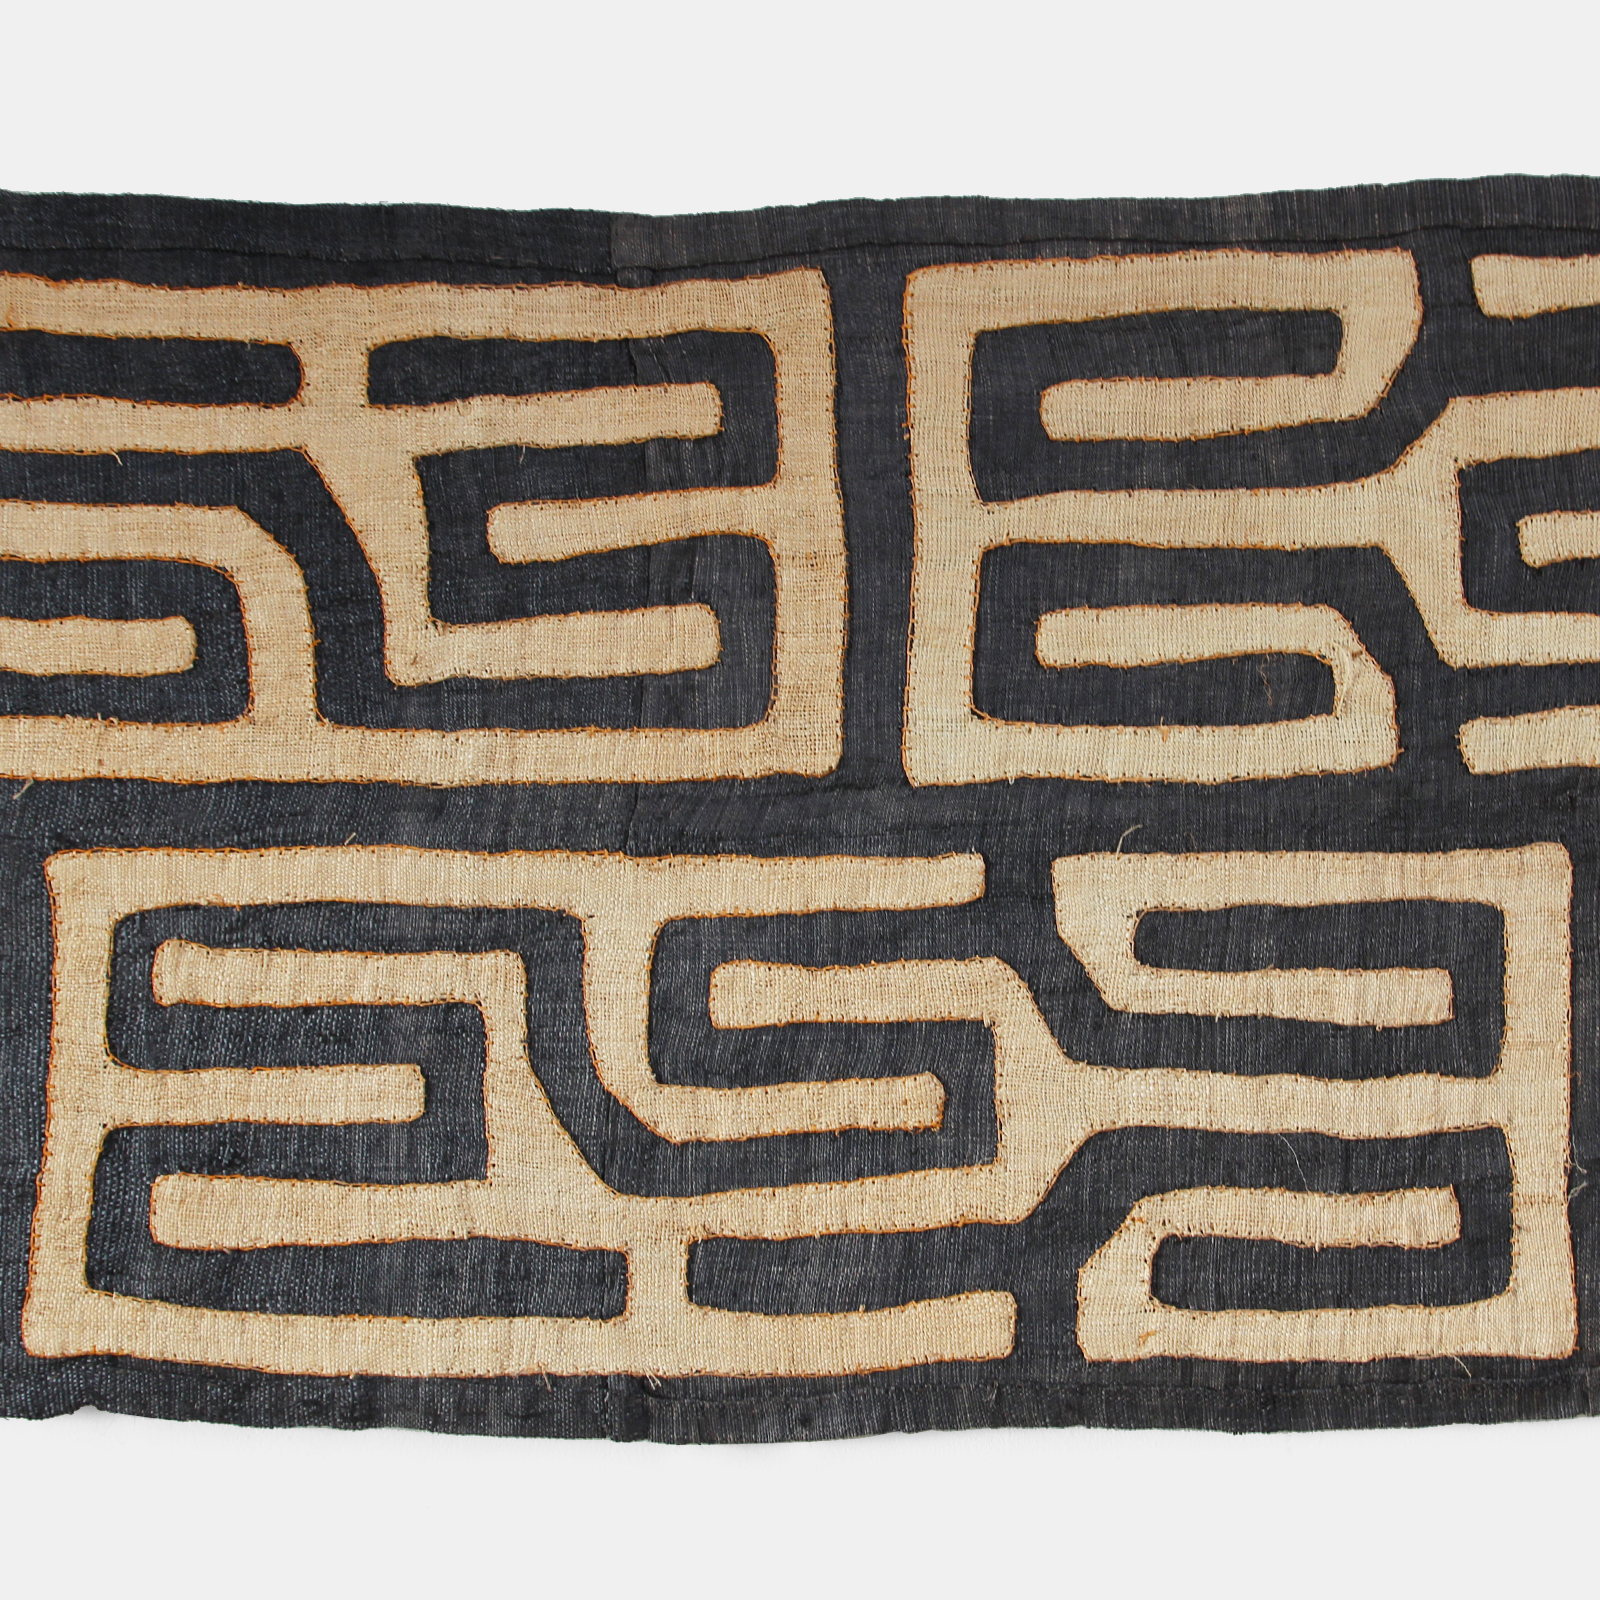 Kuba Cloth Panel Furniture Design Mix Gallery